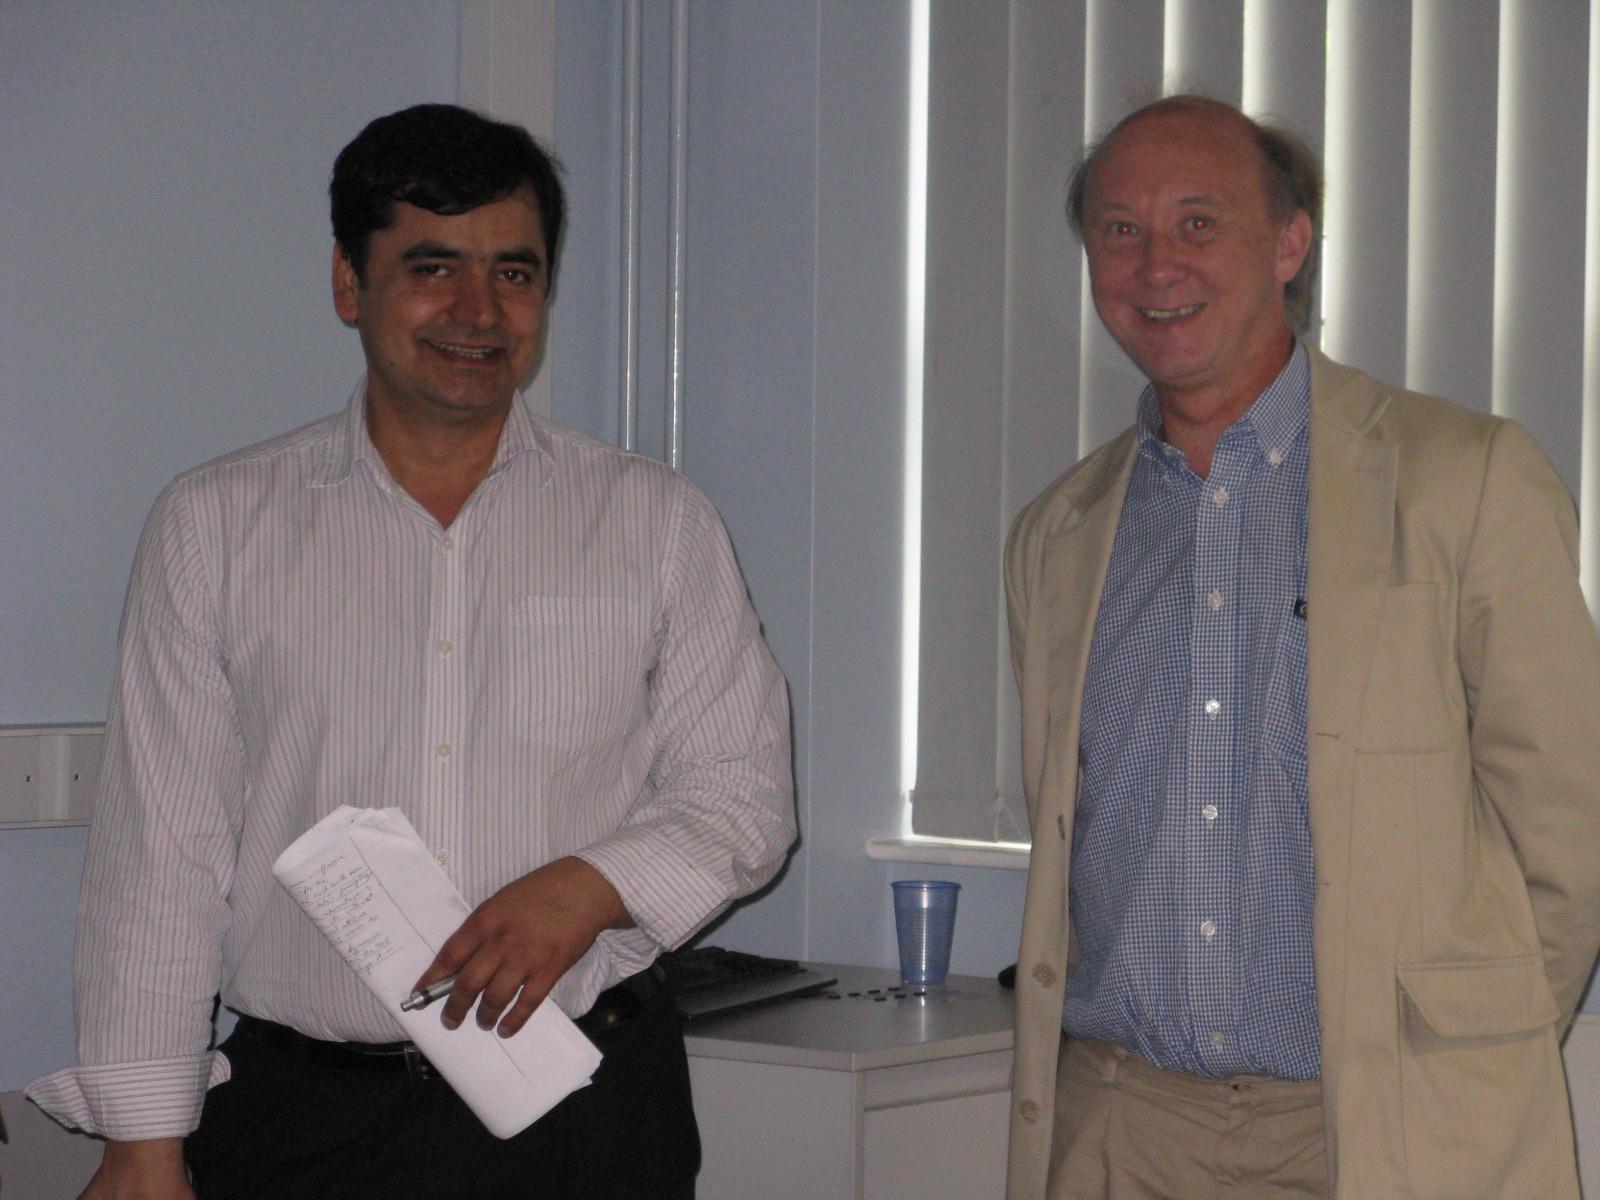 Tahir Mahmood and Ian Talbot